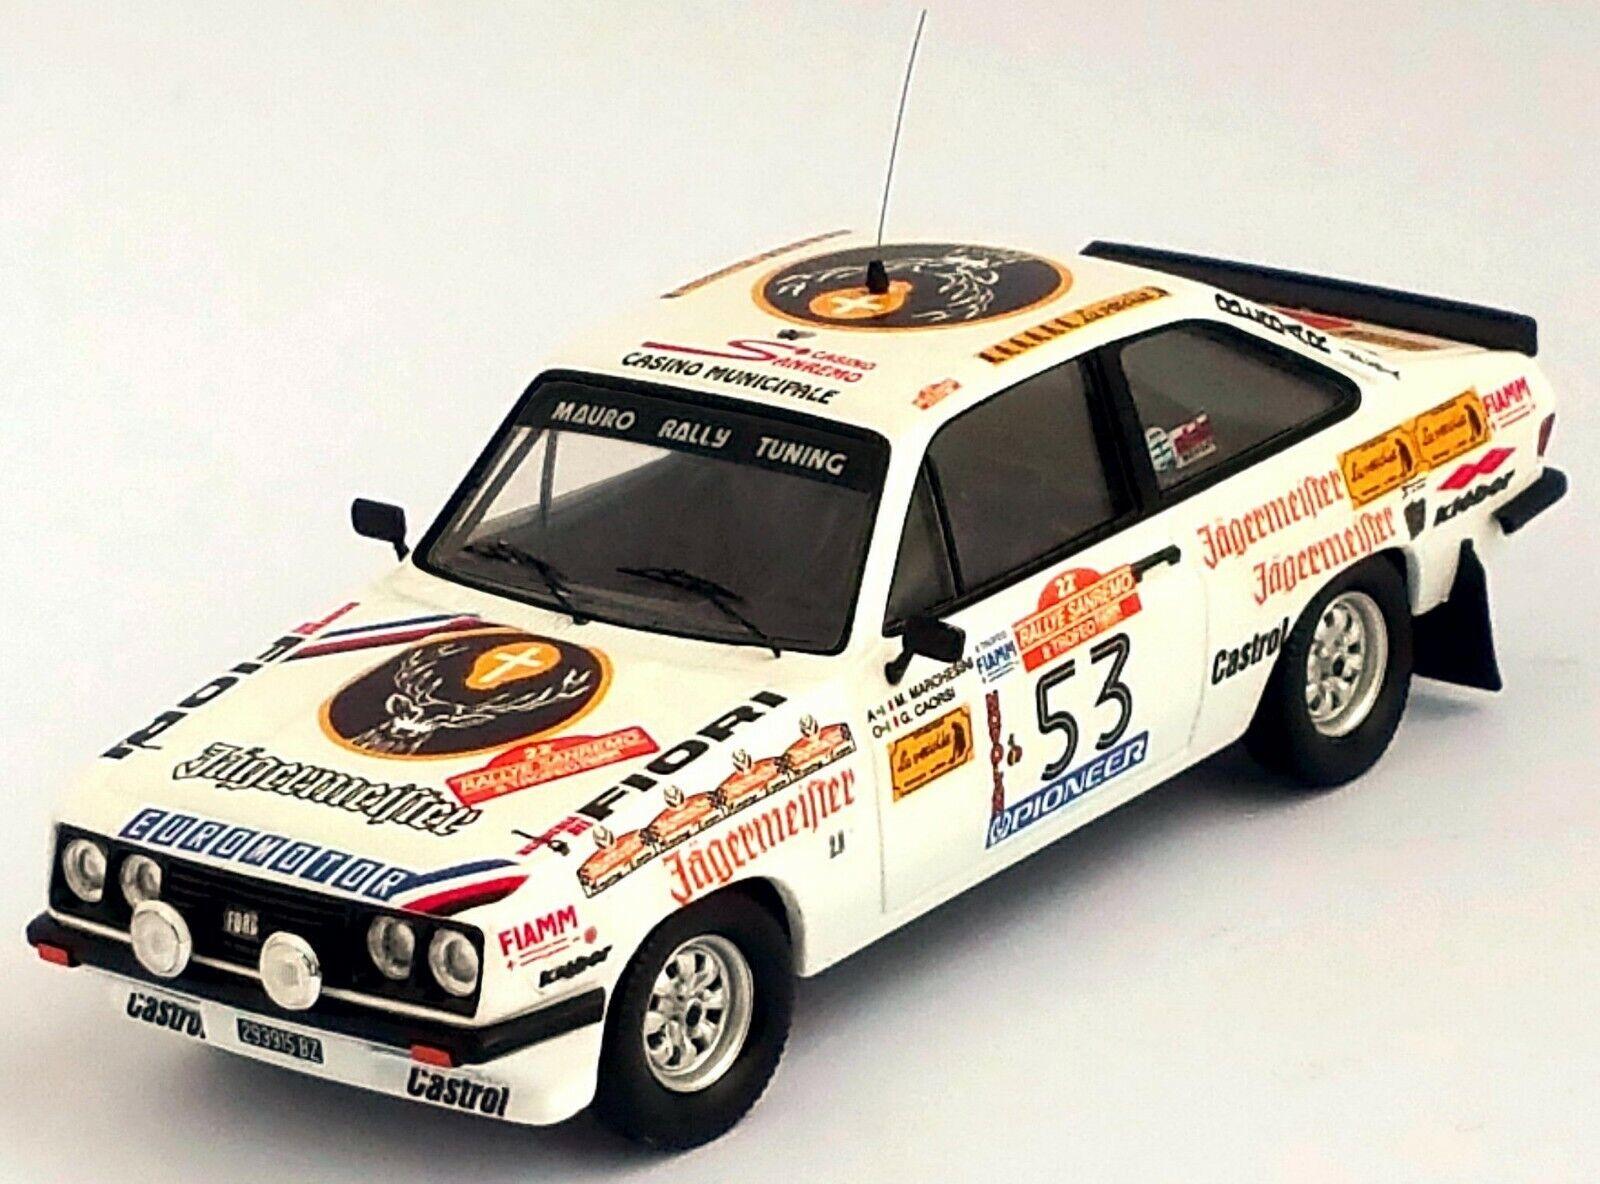 Ford Escort Mk2 RS2000 -Sanremo rally 1980  M.Marchesini Gianni  TROFEU RR 02